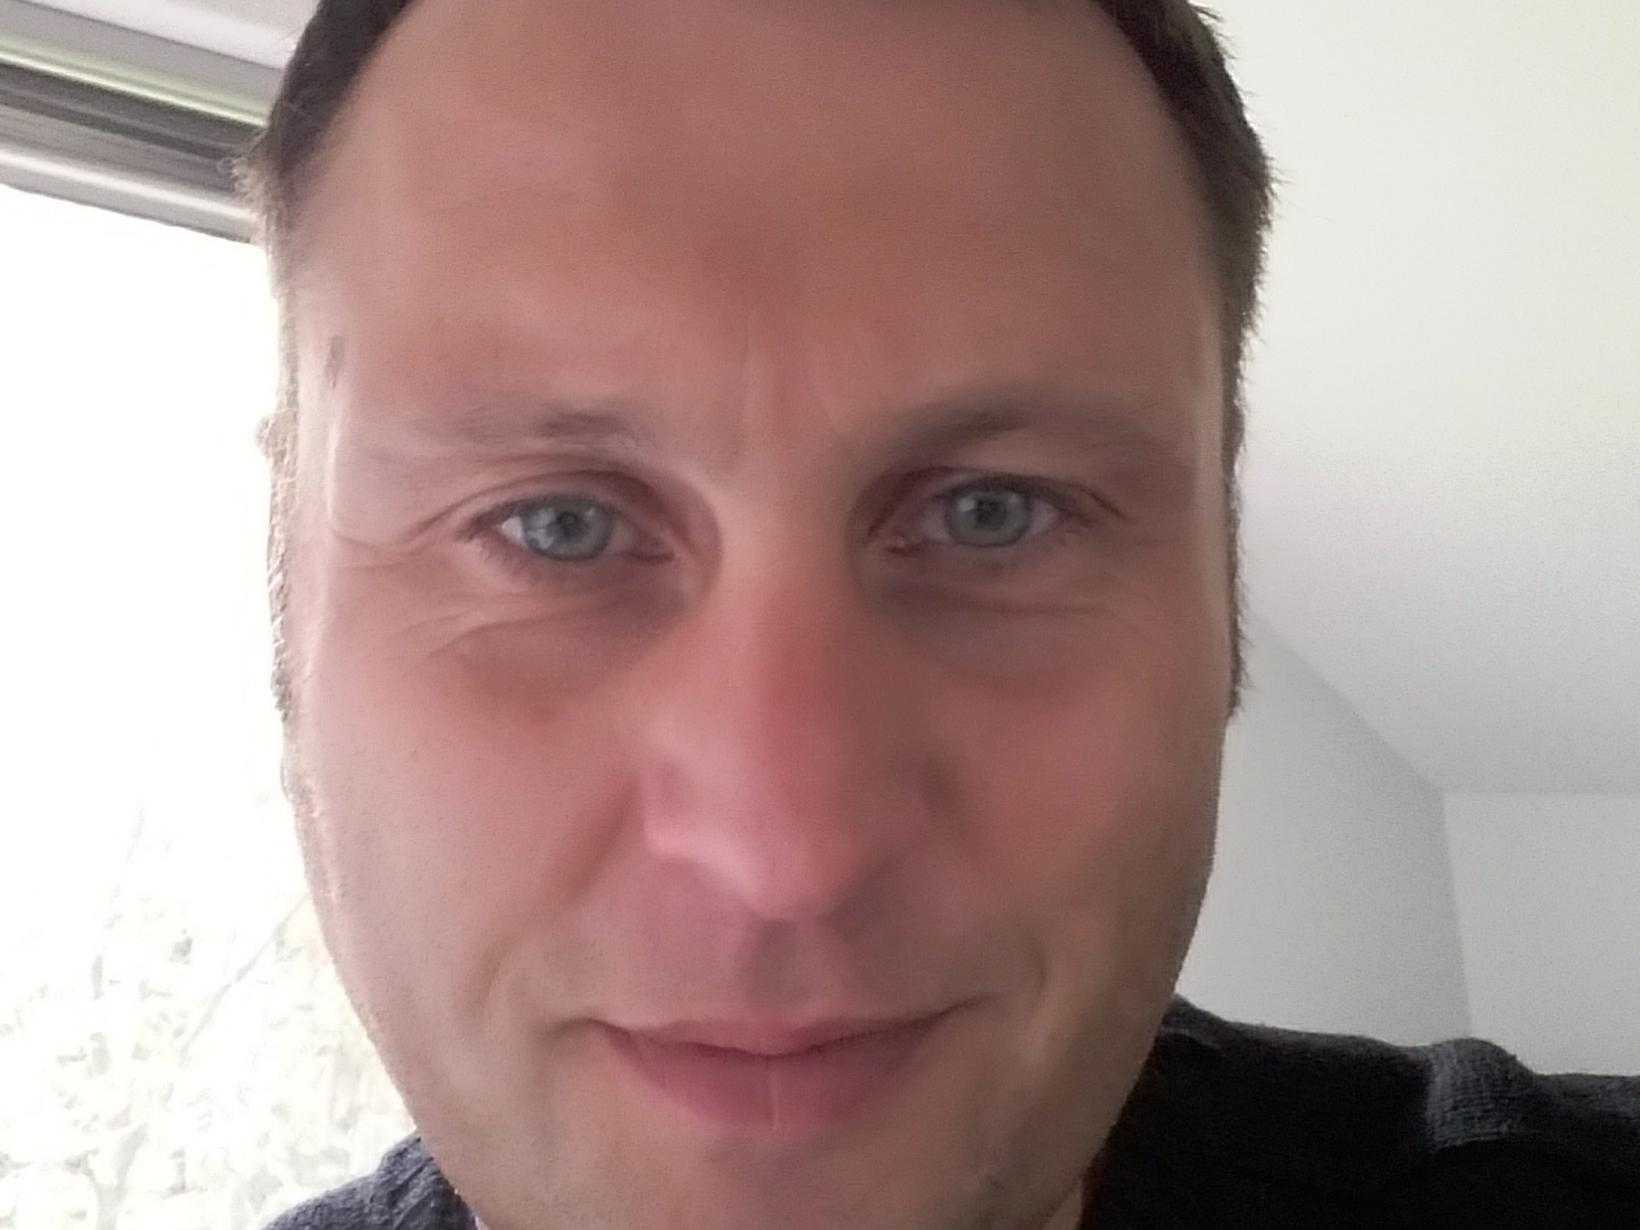 Andreas from Dubai, United Arab Emirates